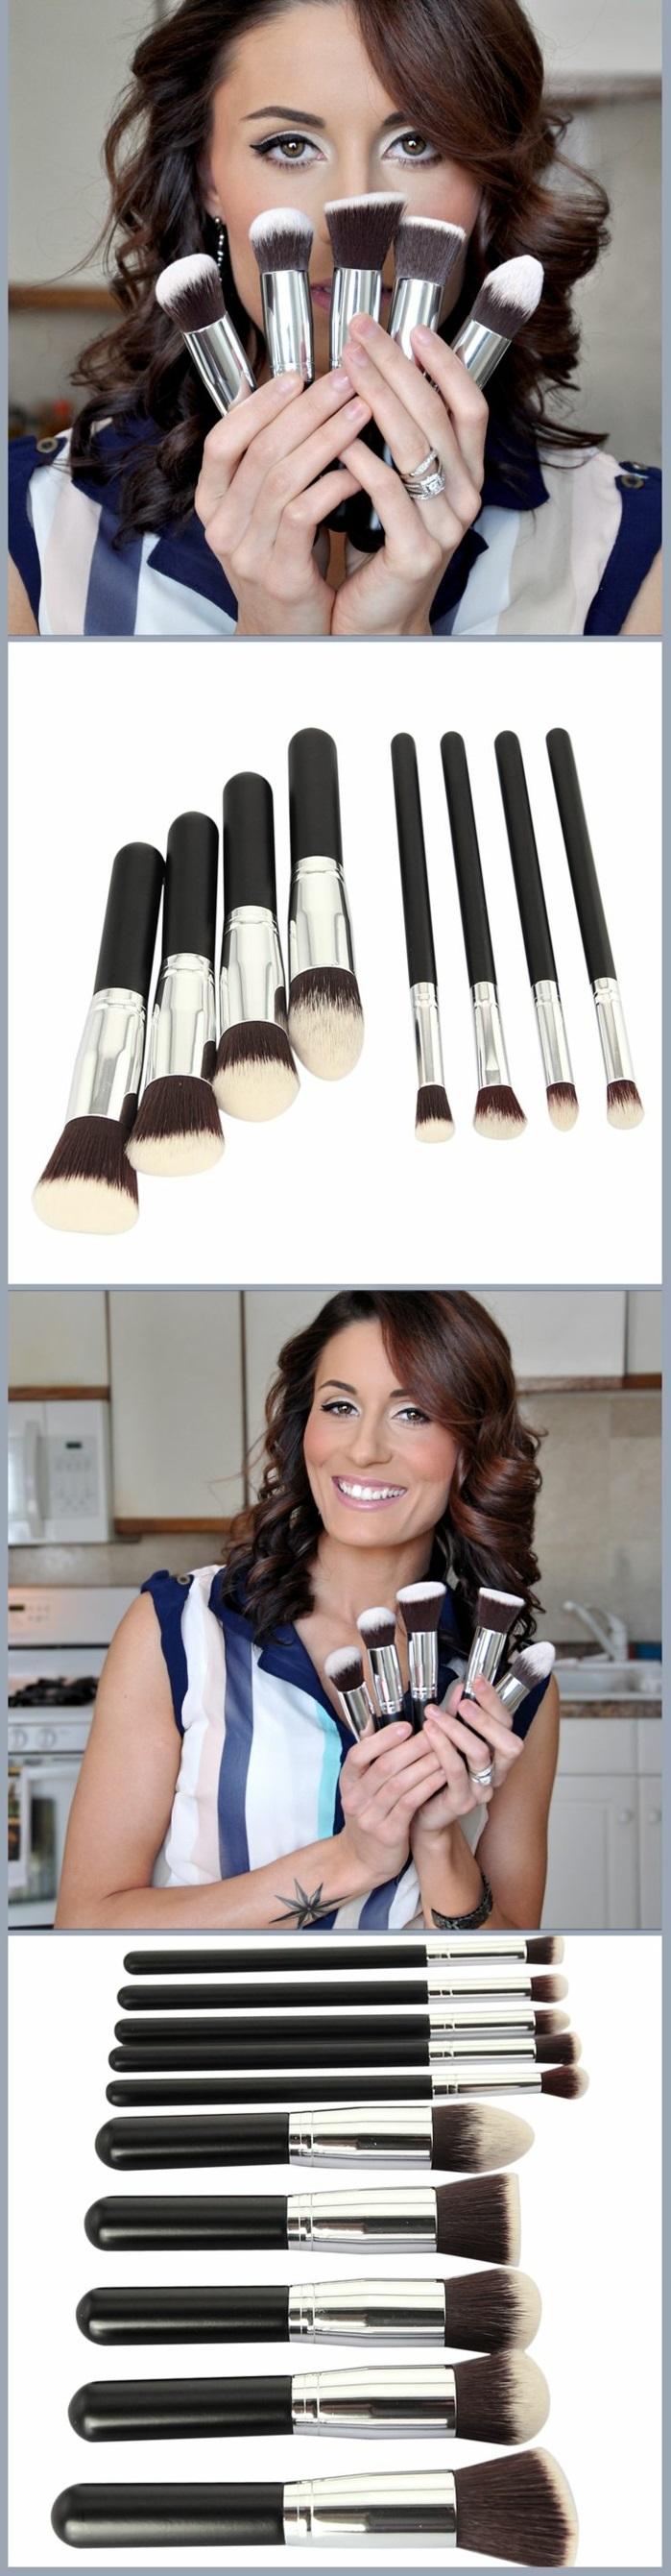 pinceaux-maquillage-professionnel-essentielles-originaux